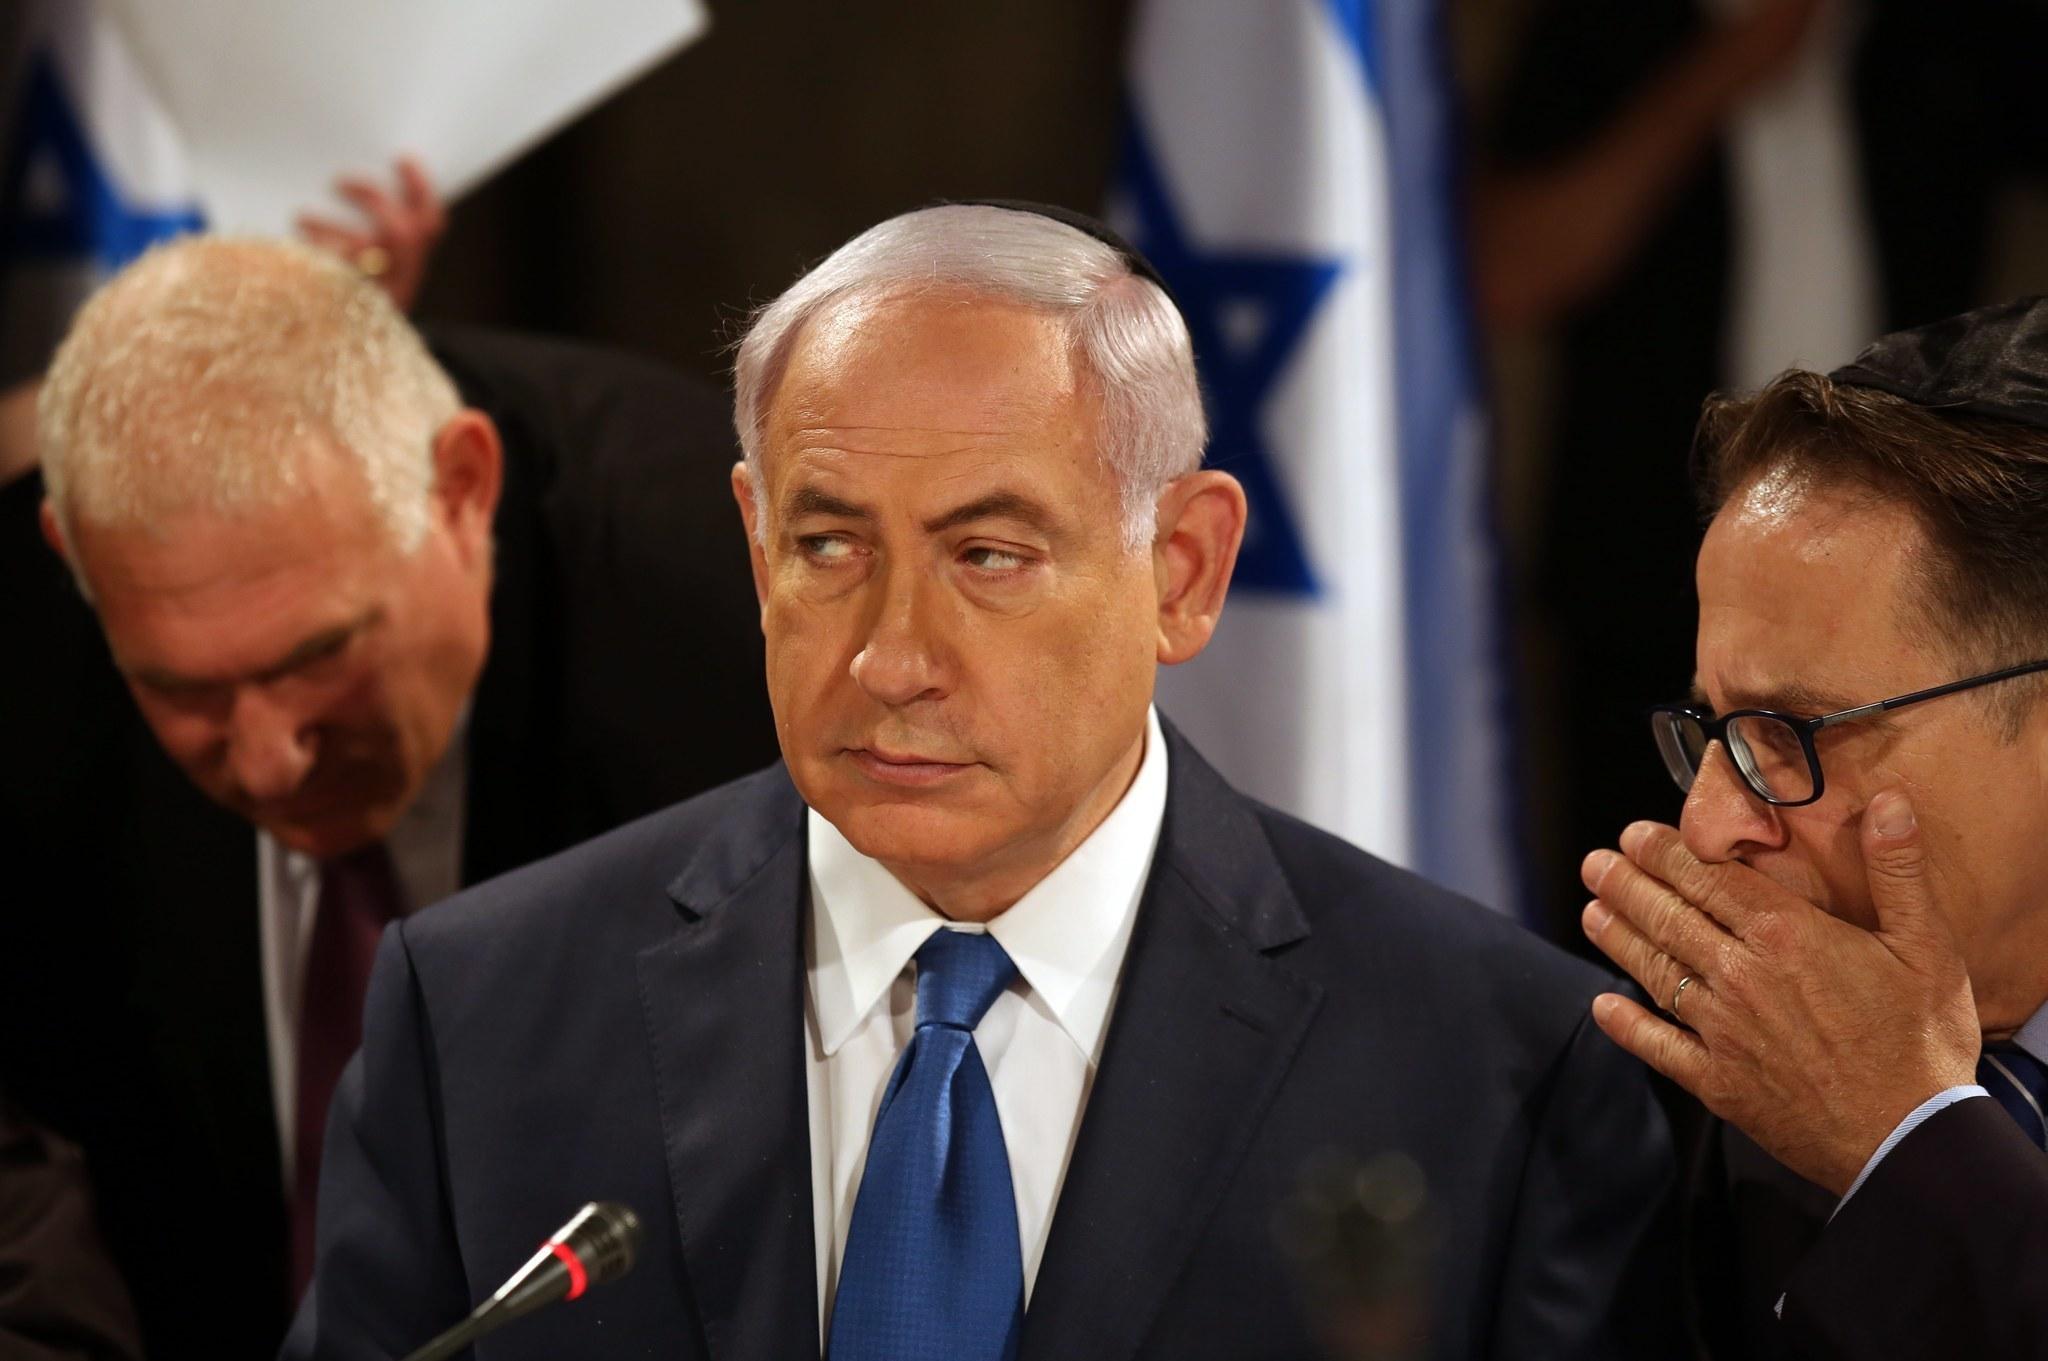 Benjamin Netanyahu: Palestinian Authority, international leaders must condemn attack - Israel News - Jerusalem Post